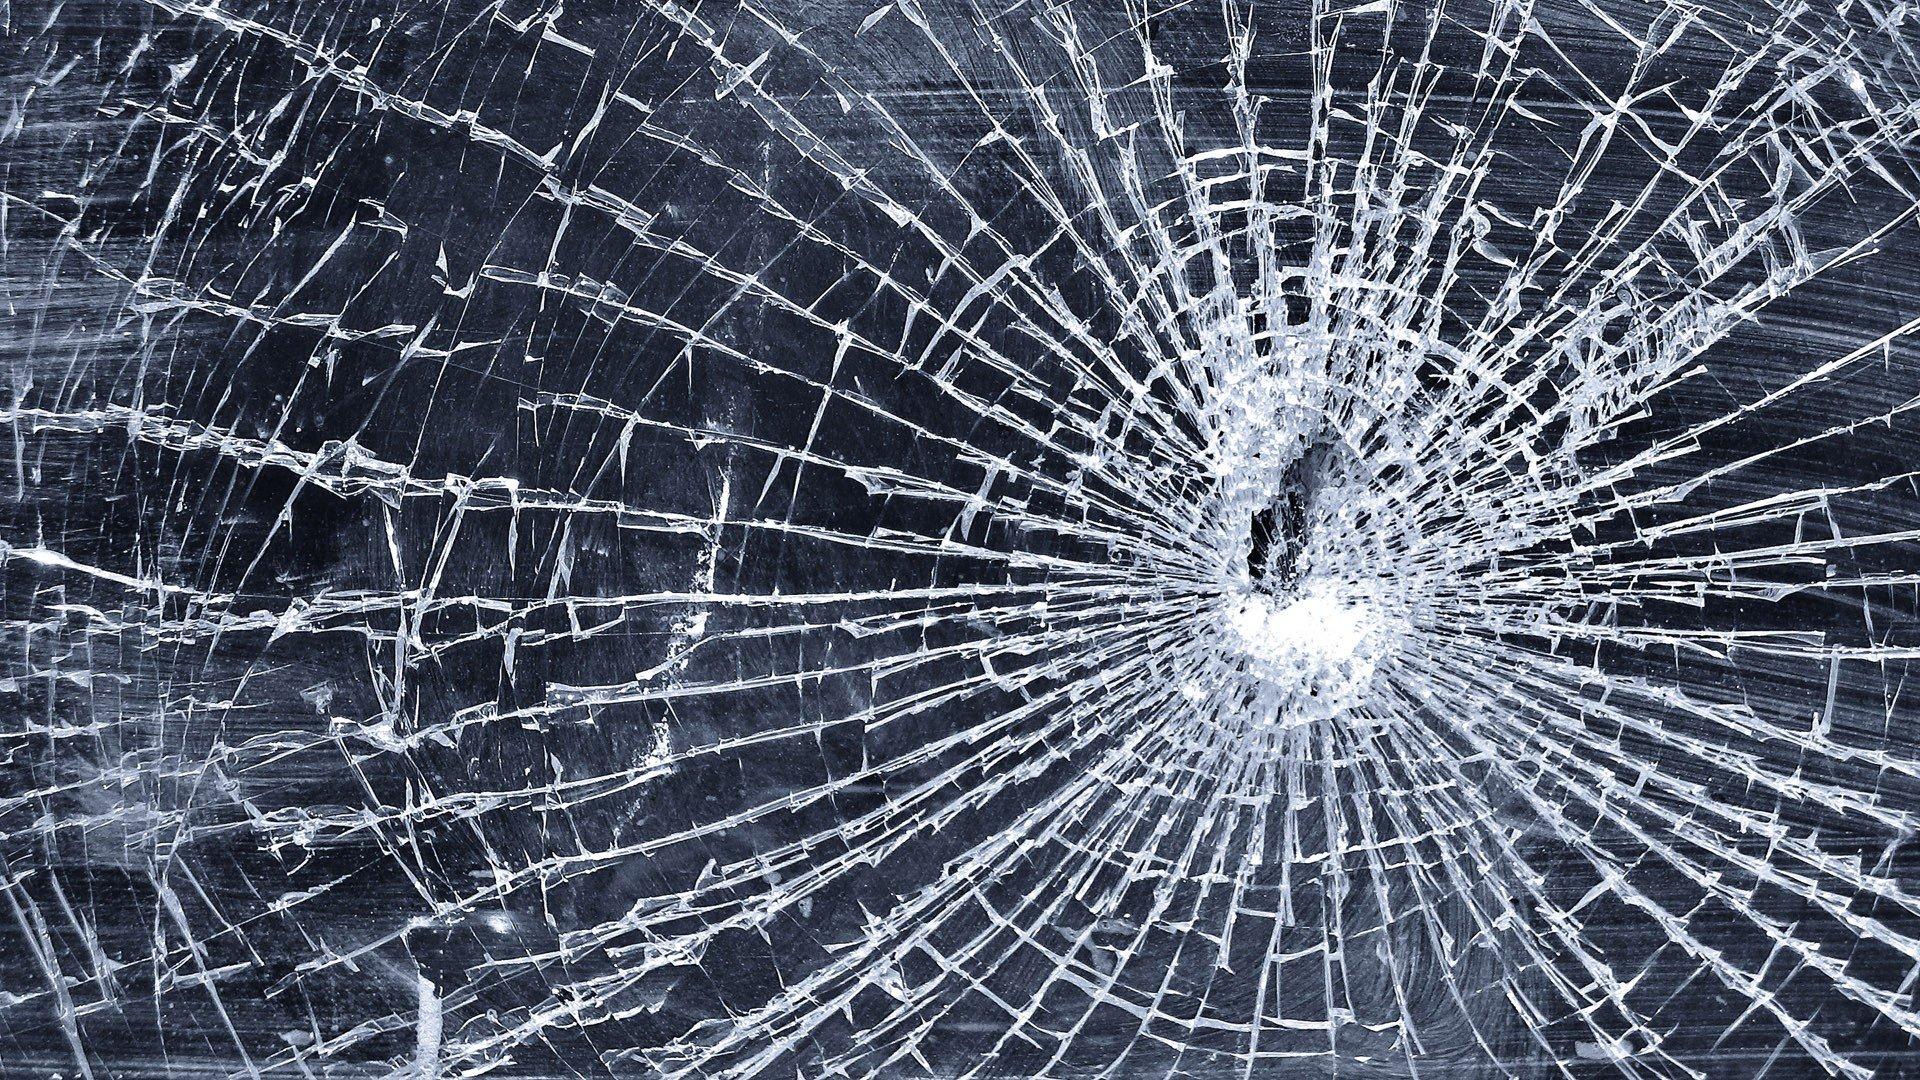 Broken broken screen wallpaper 1920x1080 339767 WallpaperUP 1920x1080